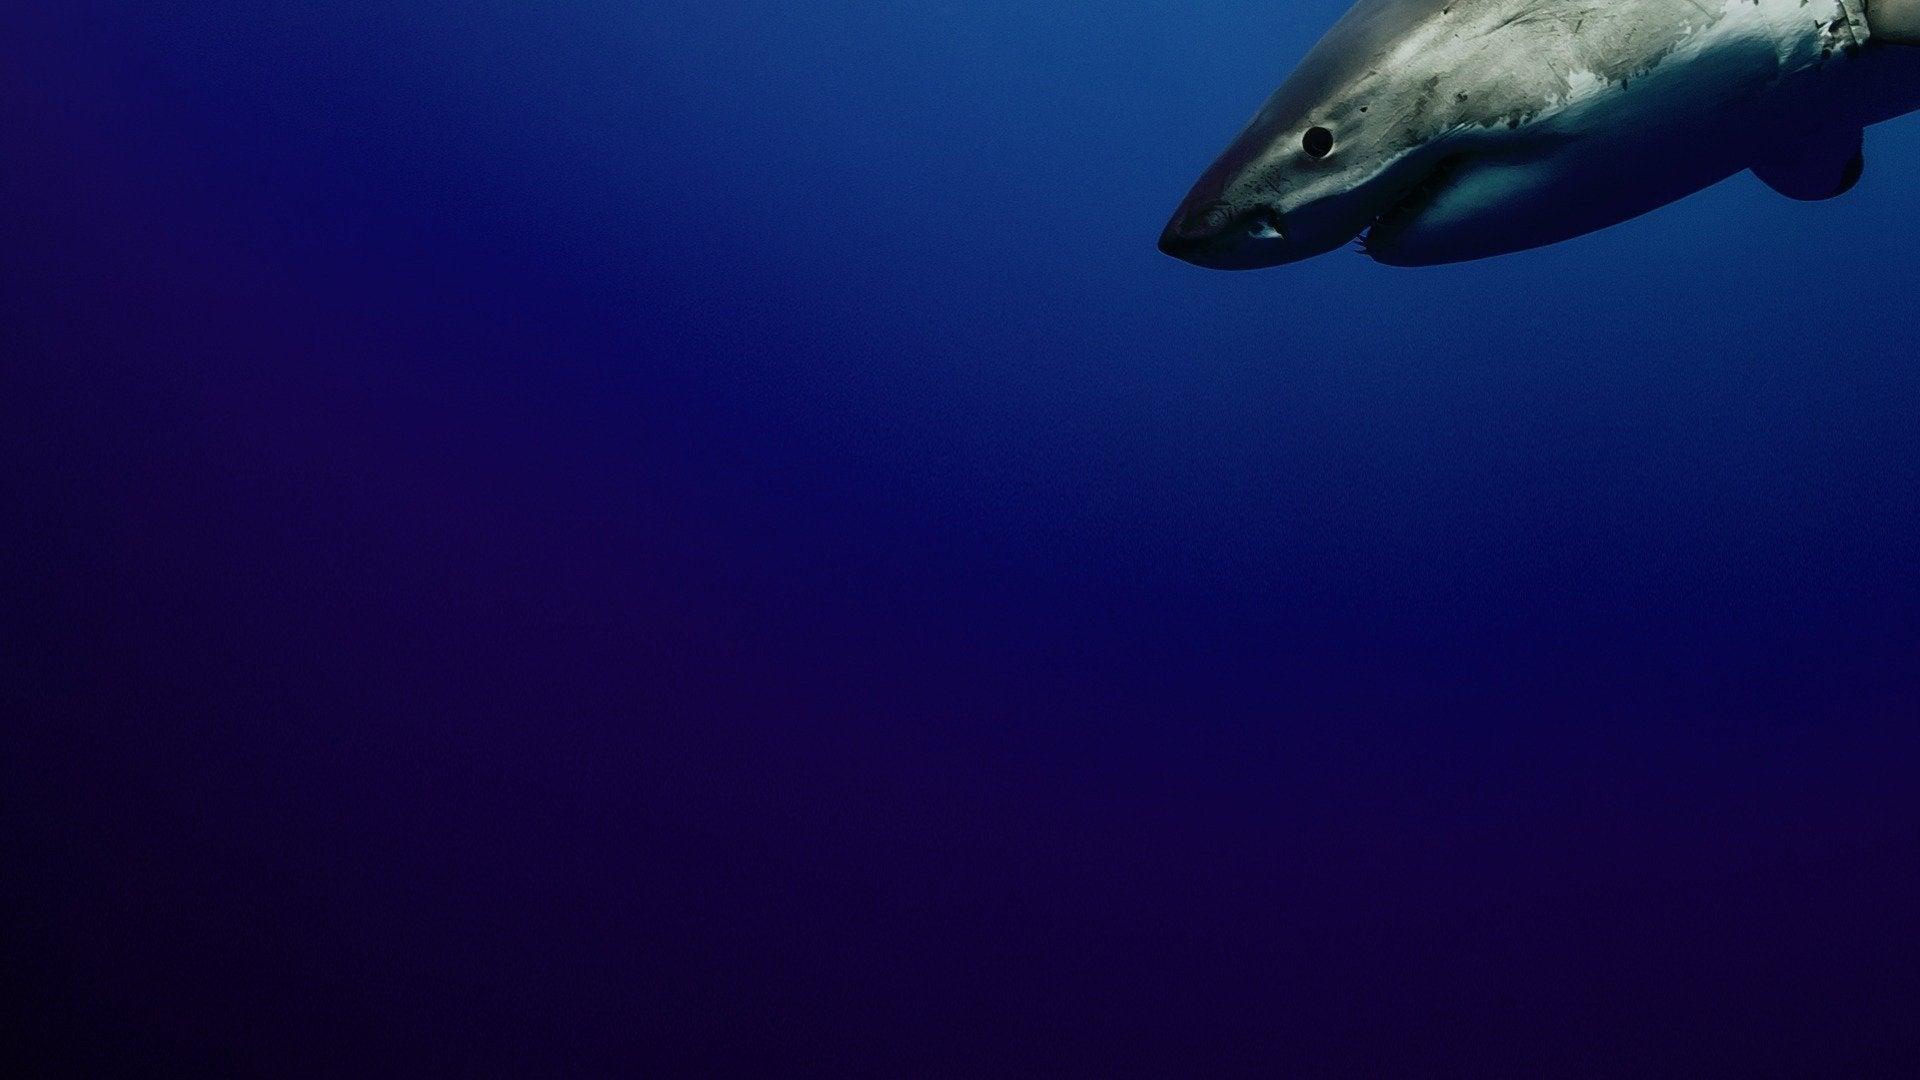 Cuba's Secret Shark Lair: Sharkopedia Edition